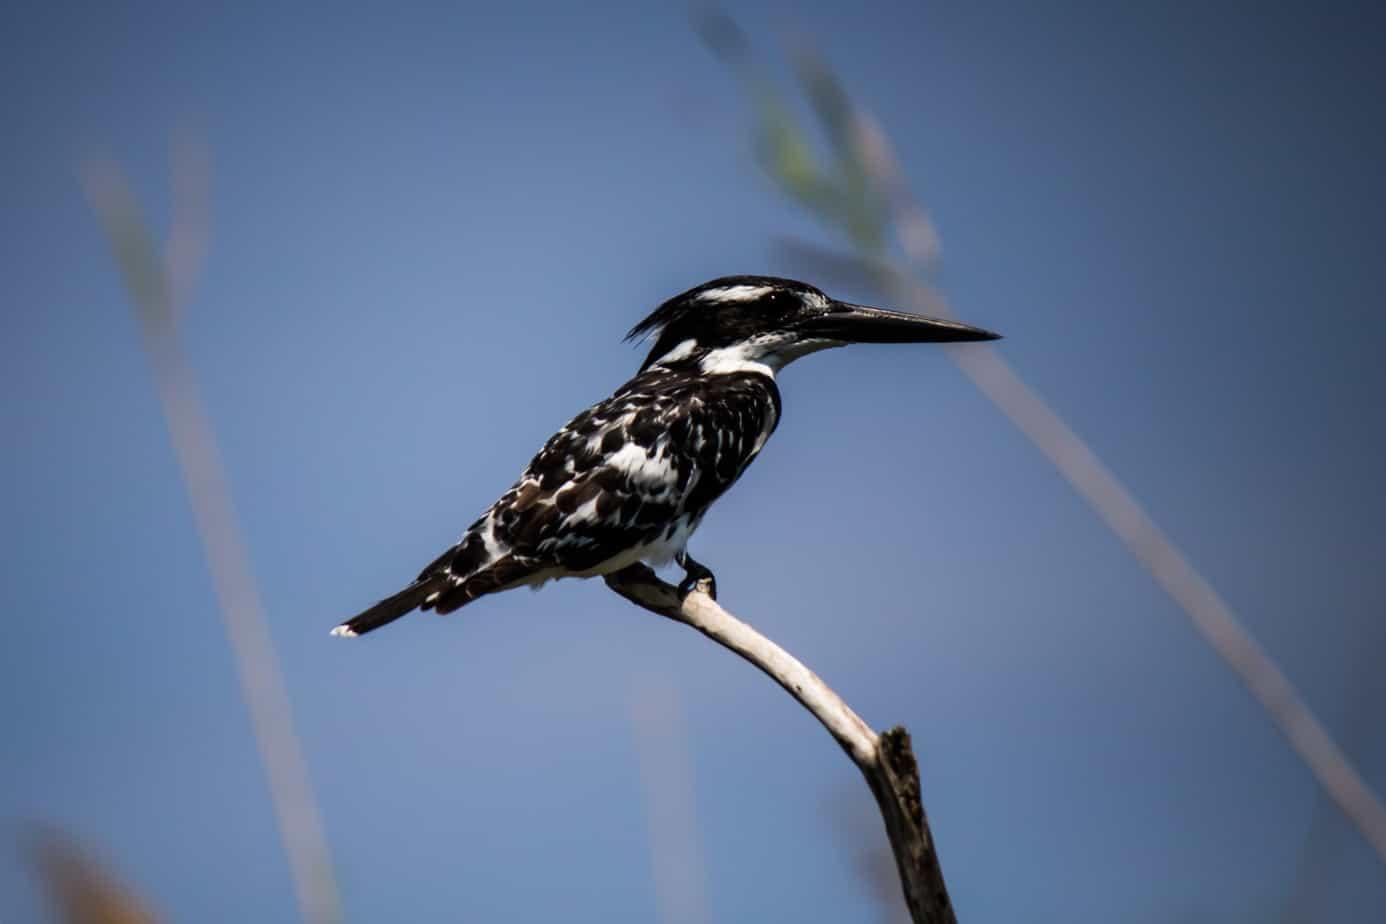 Pied Kingfisher @ Kosi Bay. Photo: Håvard Rosenlund